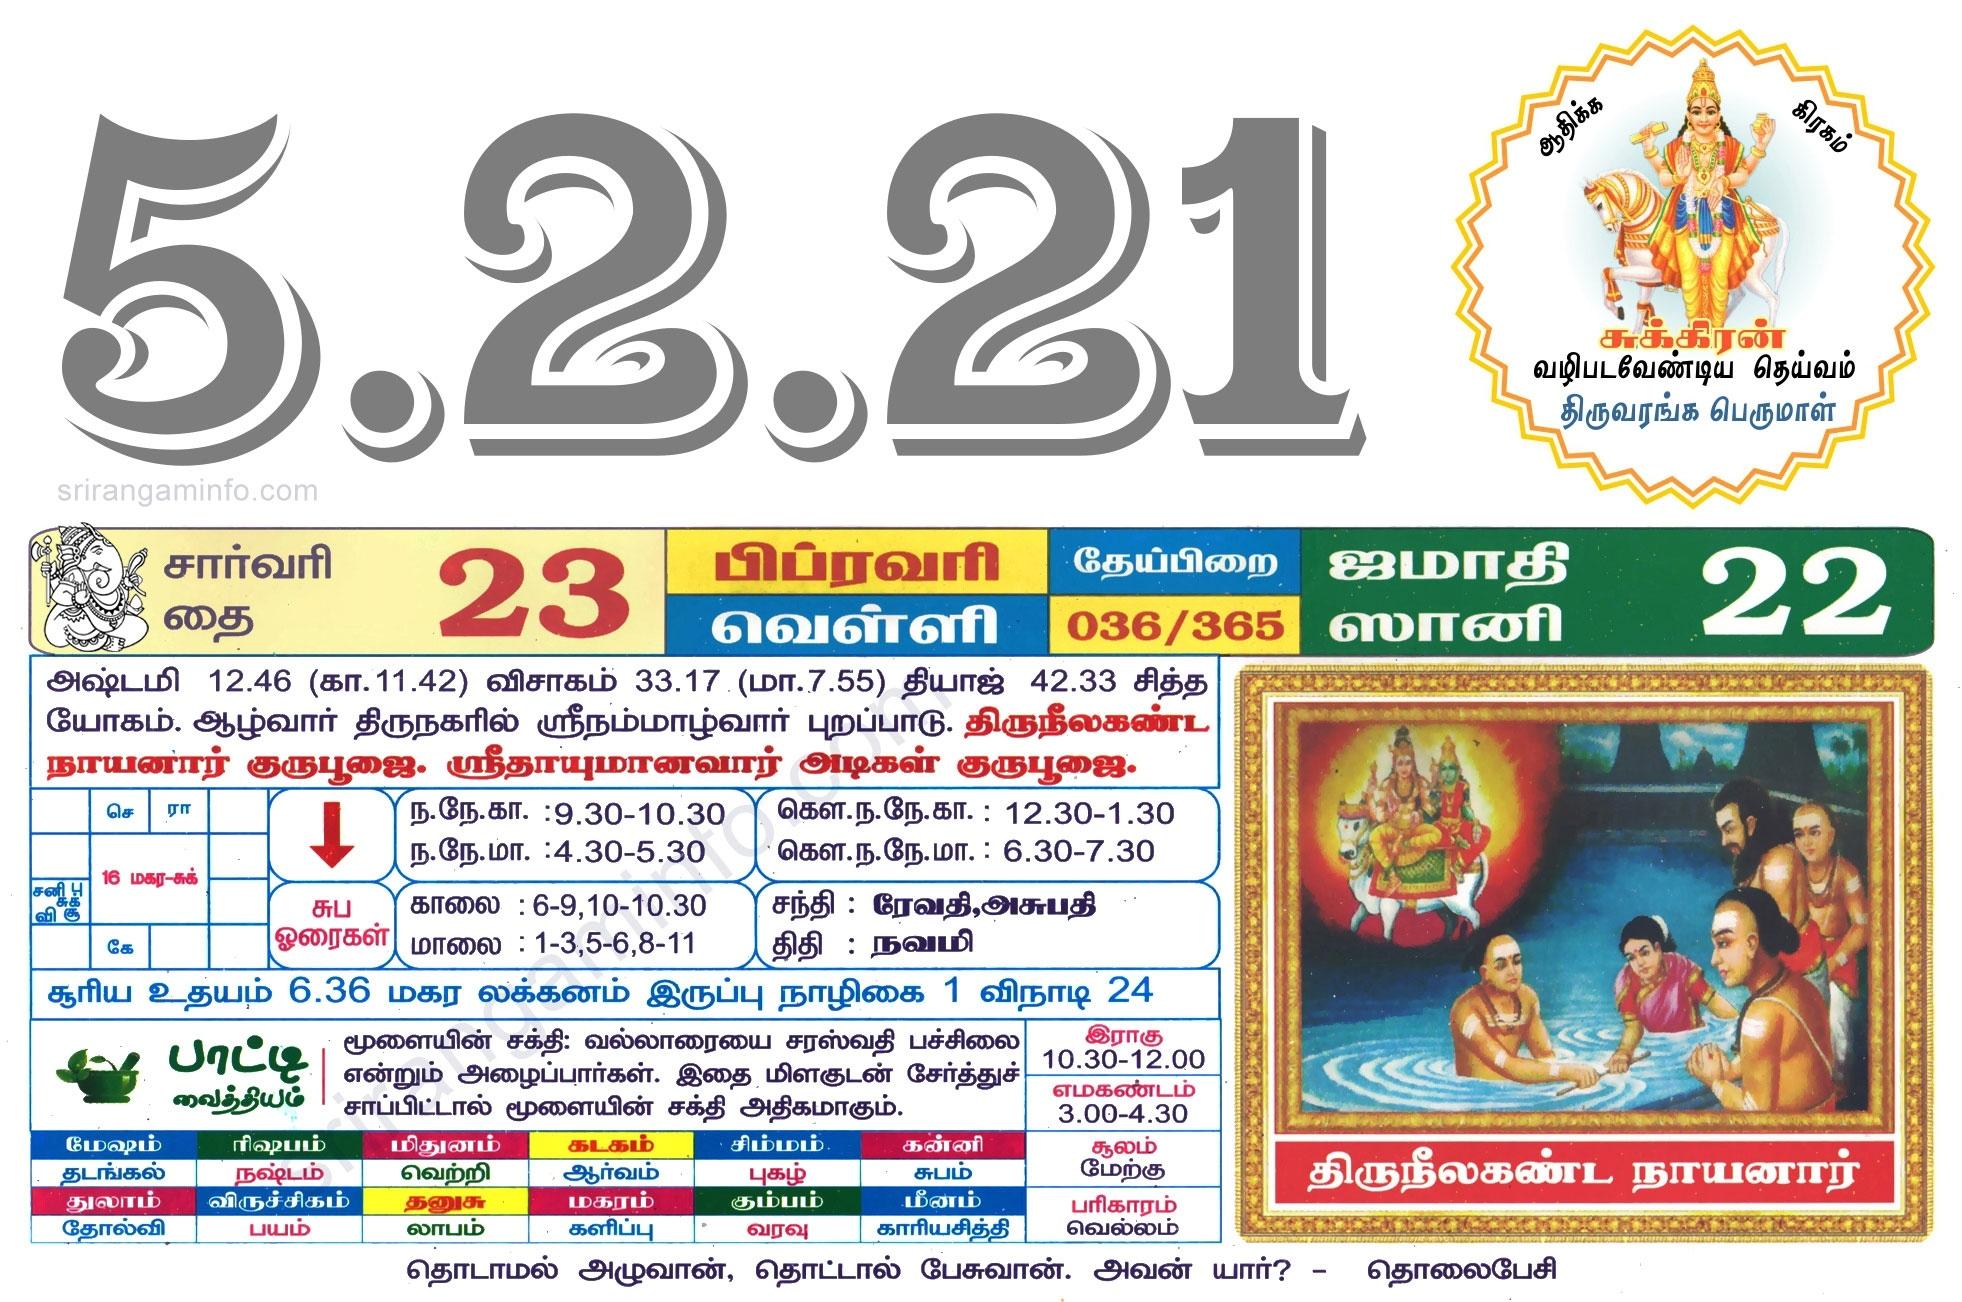 Tamil Daily Calendar 2021, Tamil Calendar 2021, Nalla Neram - தமிழ் தினசரி காலண்டர் Tamil Daily Calendar 2021 December